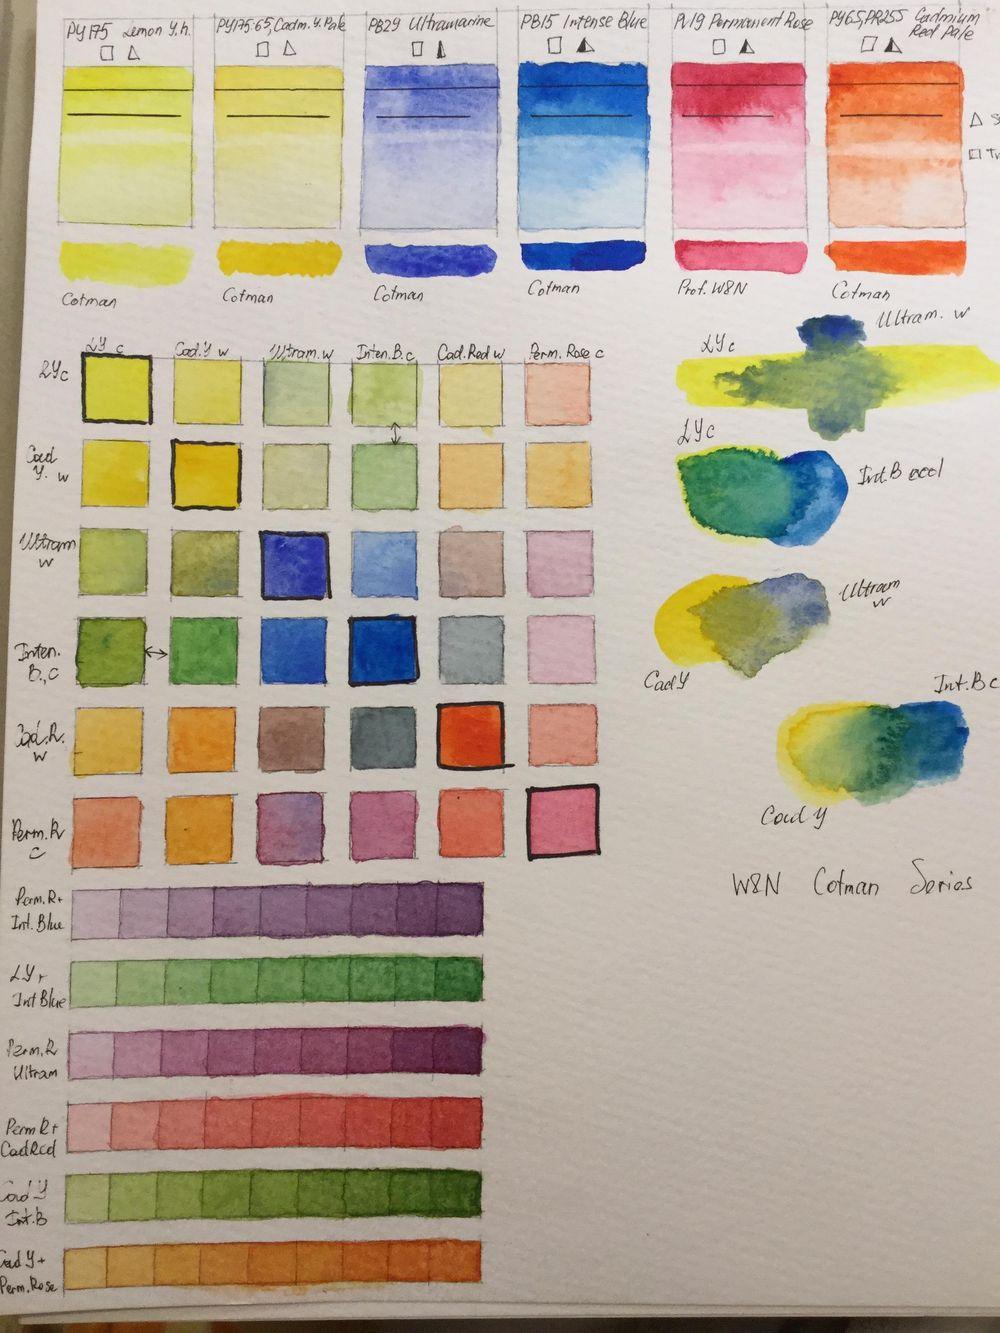 Colour symphony - image 2 - student project